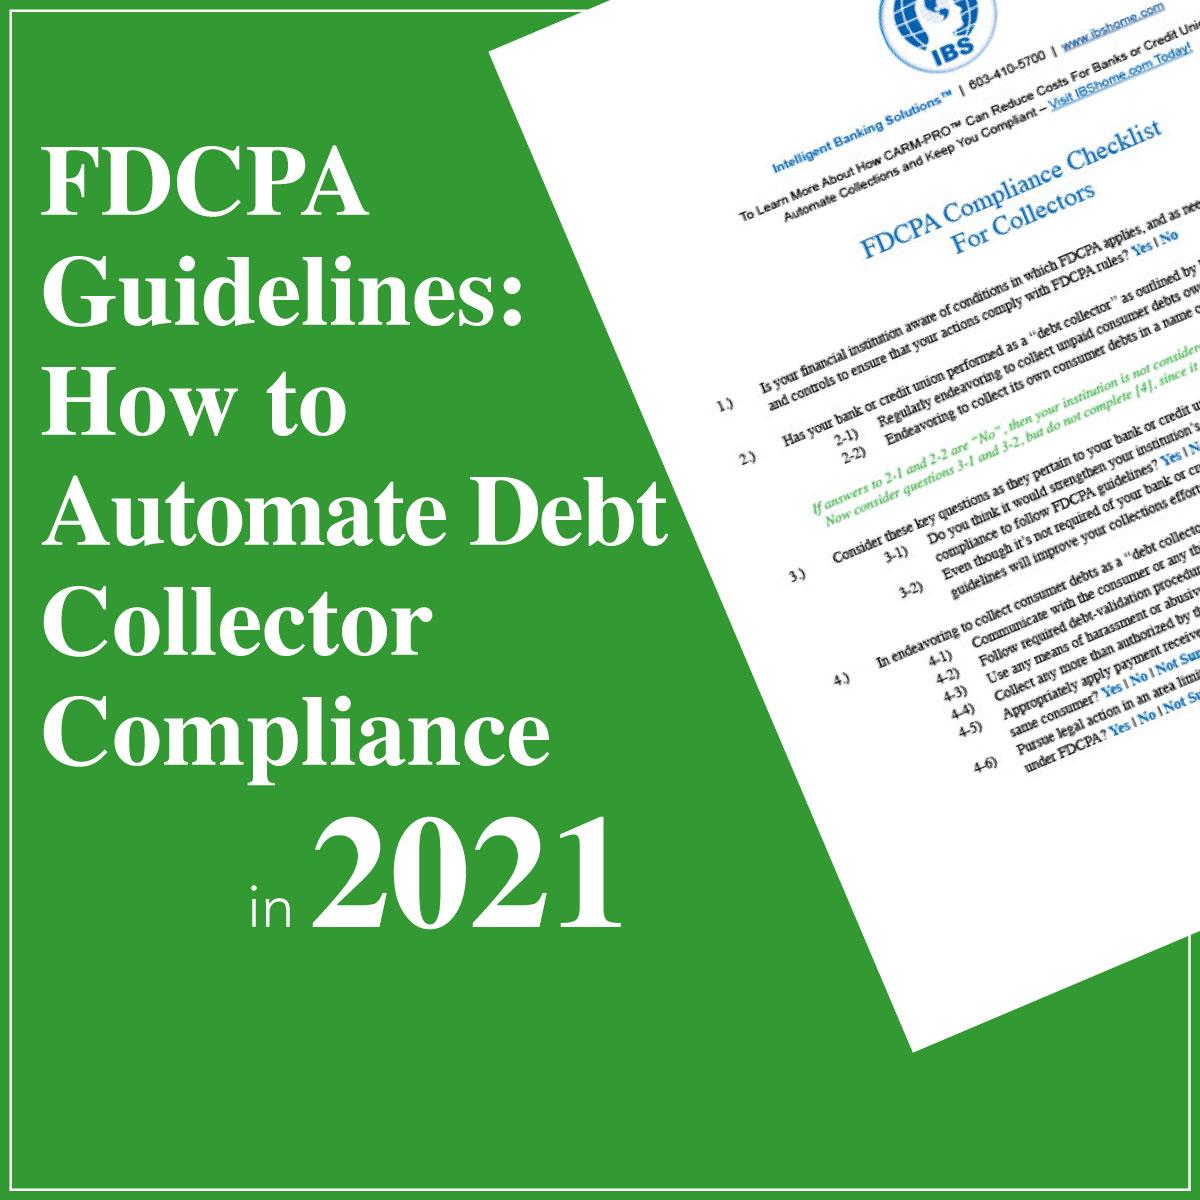 FDCPA Compliance Checklist Article Image